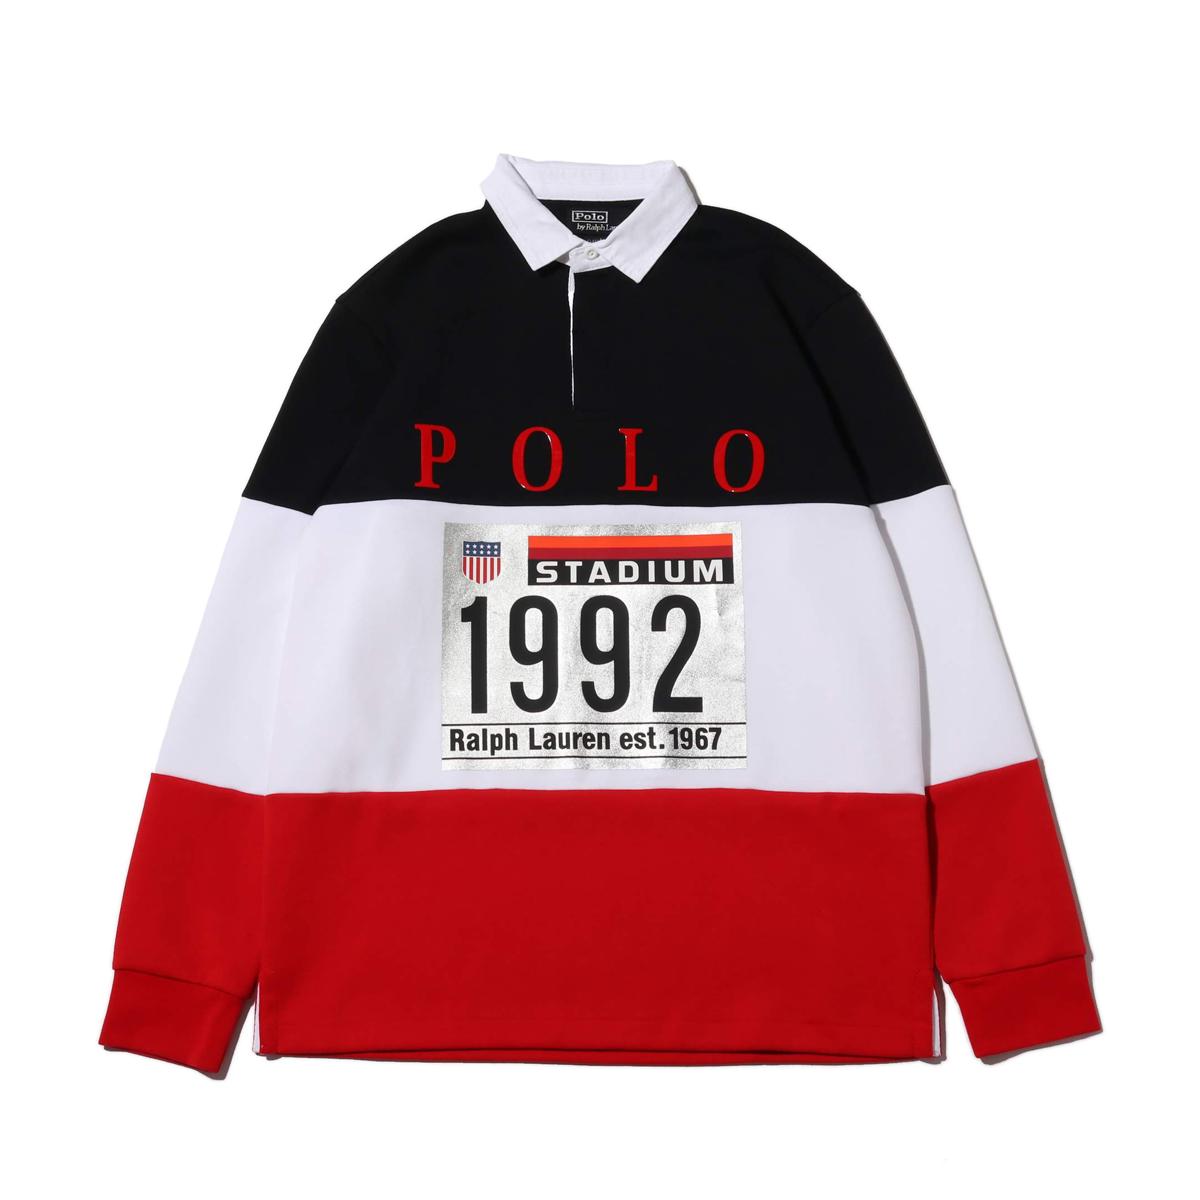 POLO RALPH LAUREN LSRUGBYM1-LONG SLEEVE-KNIT(ポロ ラルフ ローレン ロング スリーブ ニット)WHITE MULTI【メンズ セーター】18HO-I